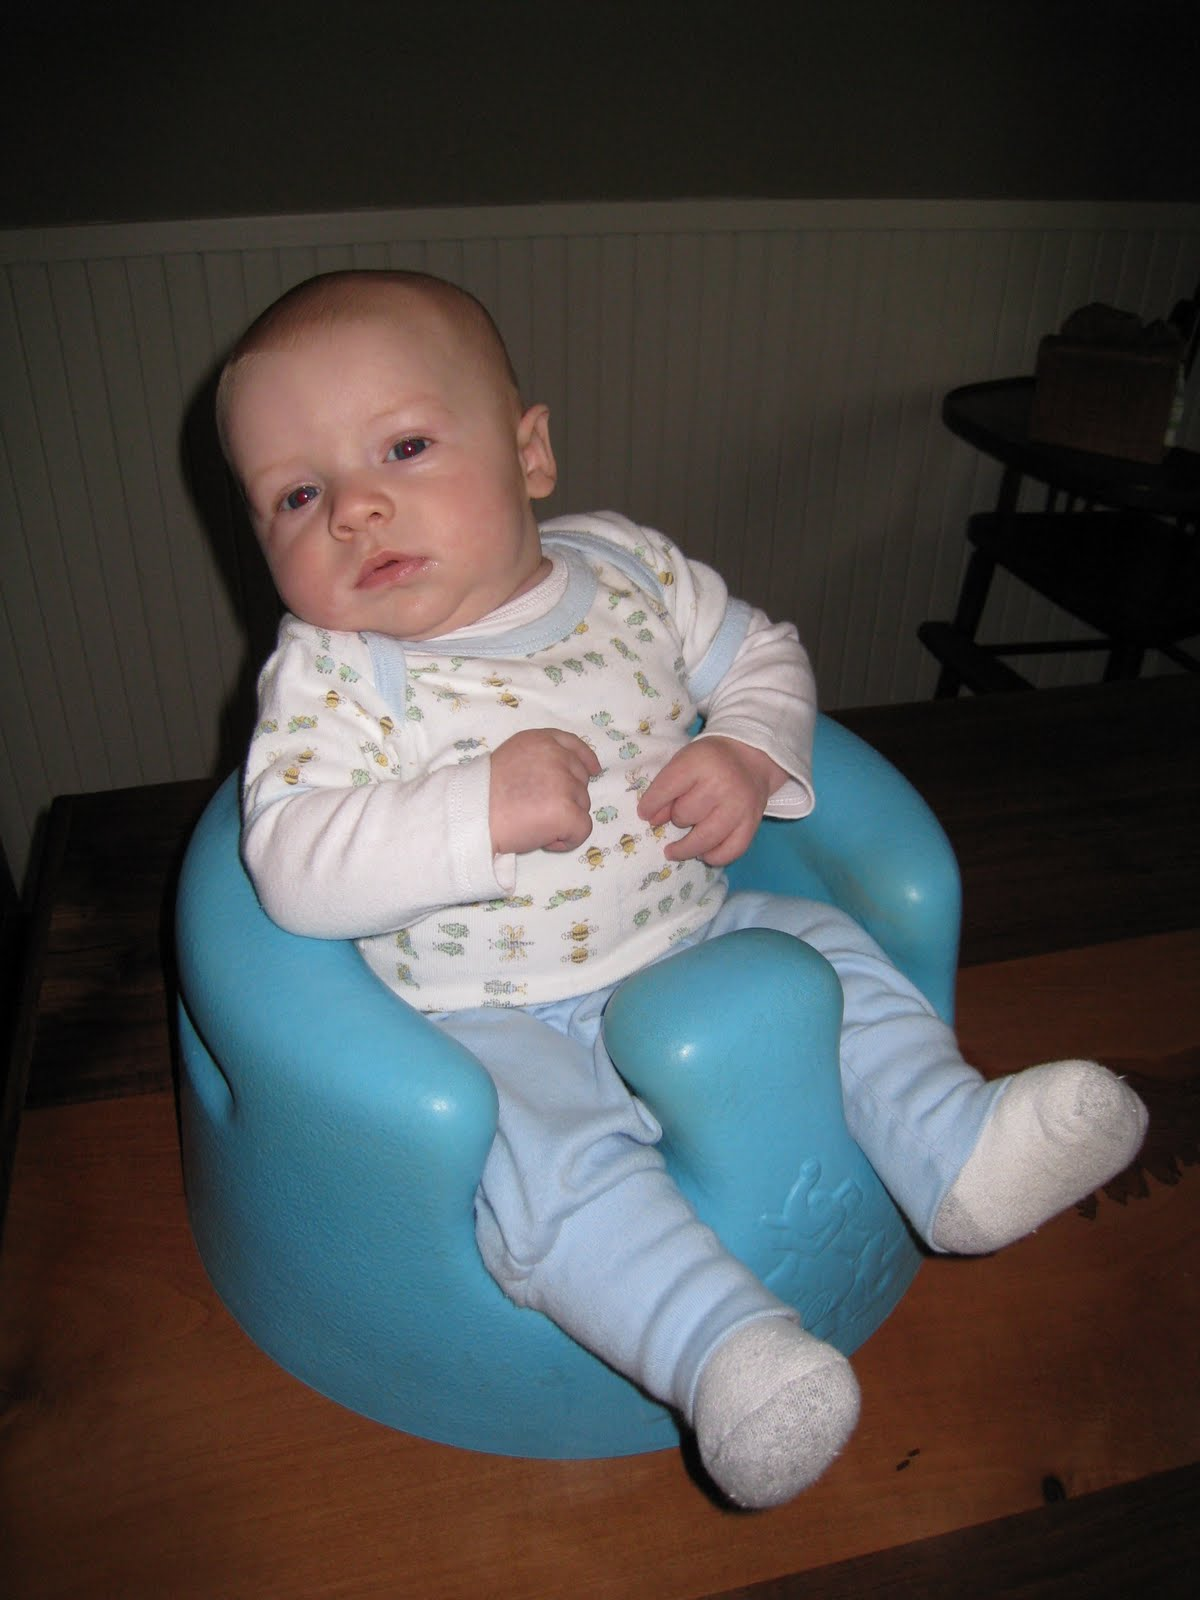 Daniel Amp Heather Amp The Kids The Bumbo Chair